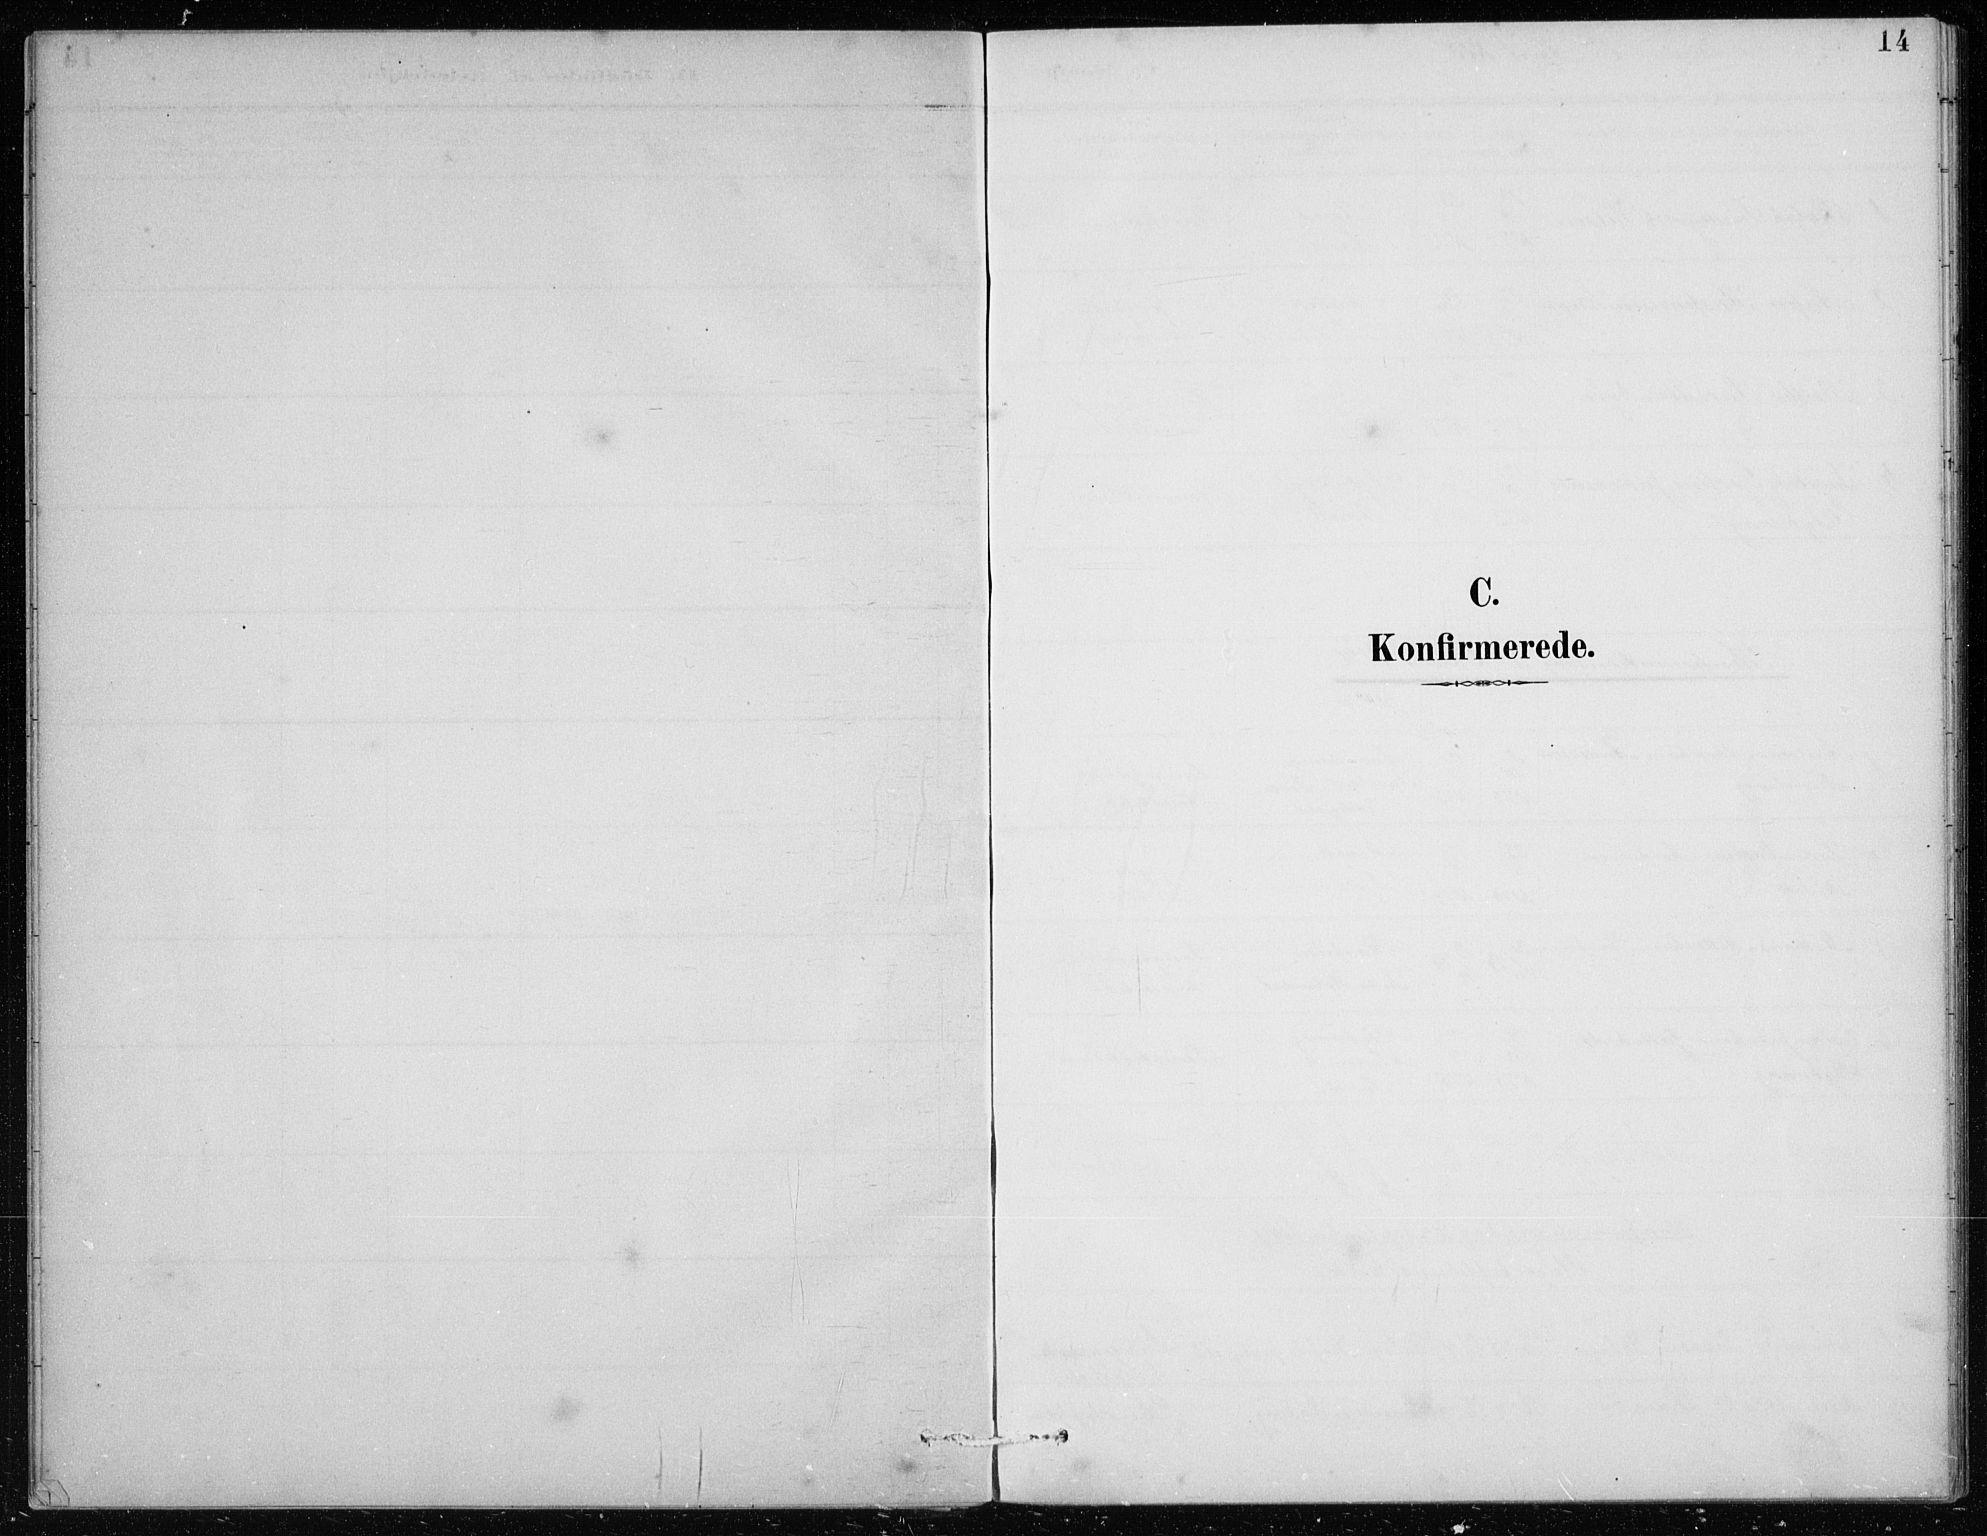 SAB, St. Jørgens hospital og Årstad sokneprestembete, Klokkerbok nr. A 10, 1886-1910, s. 44